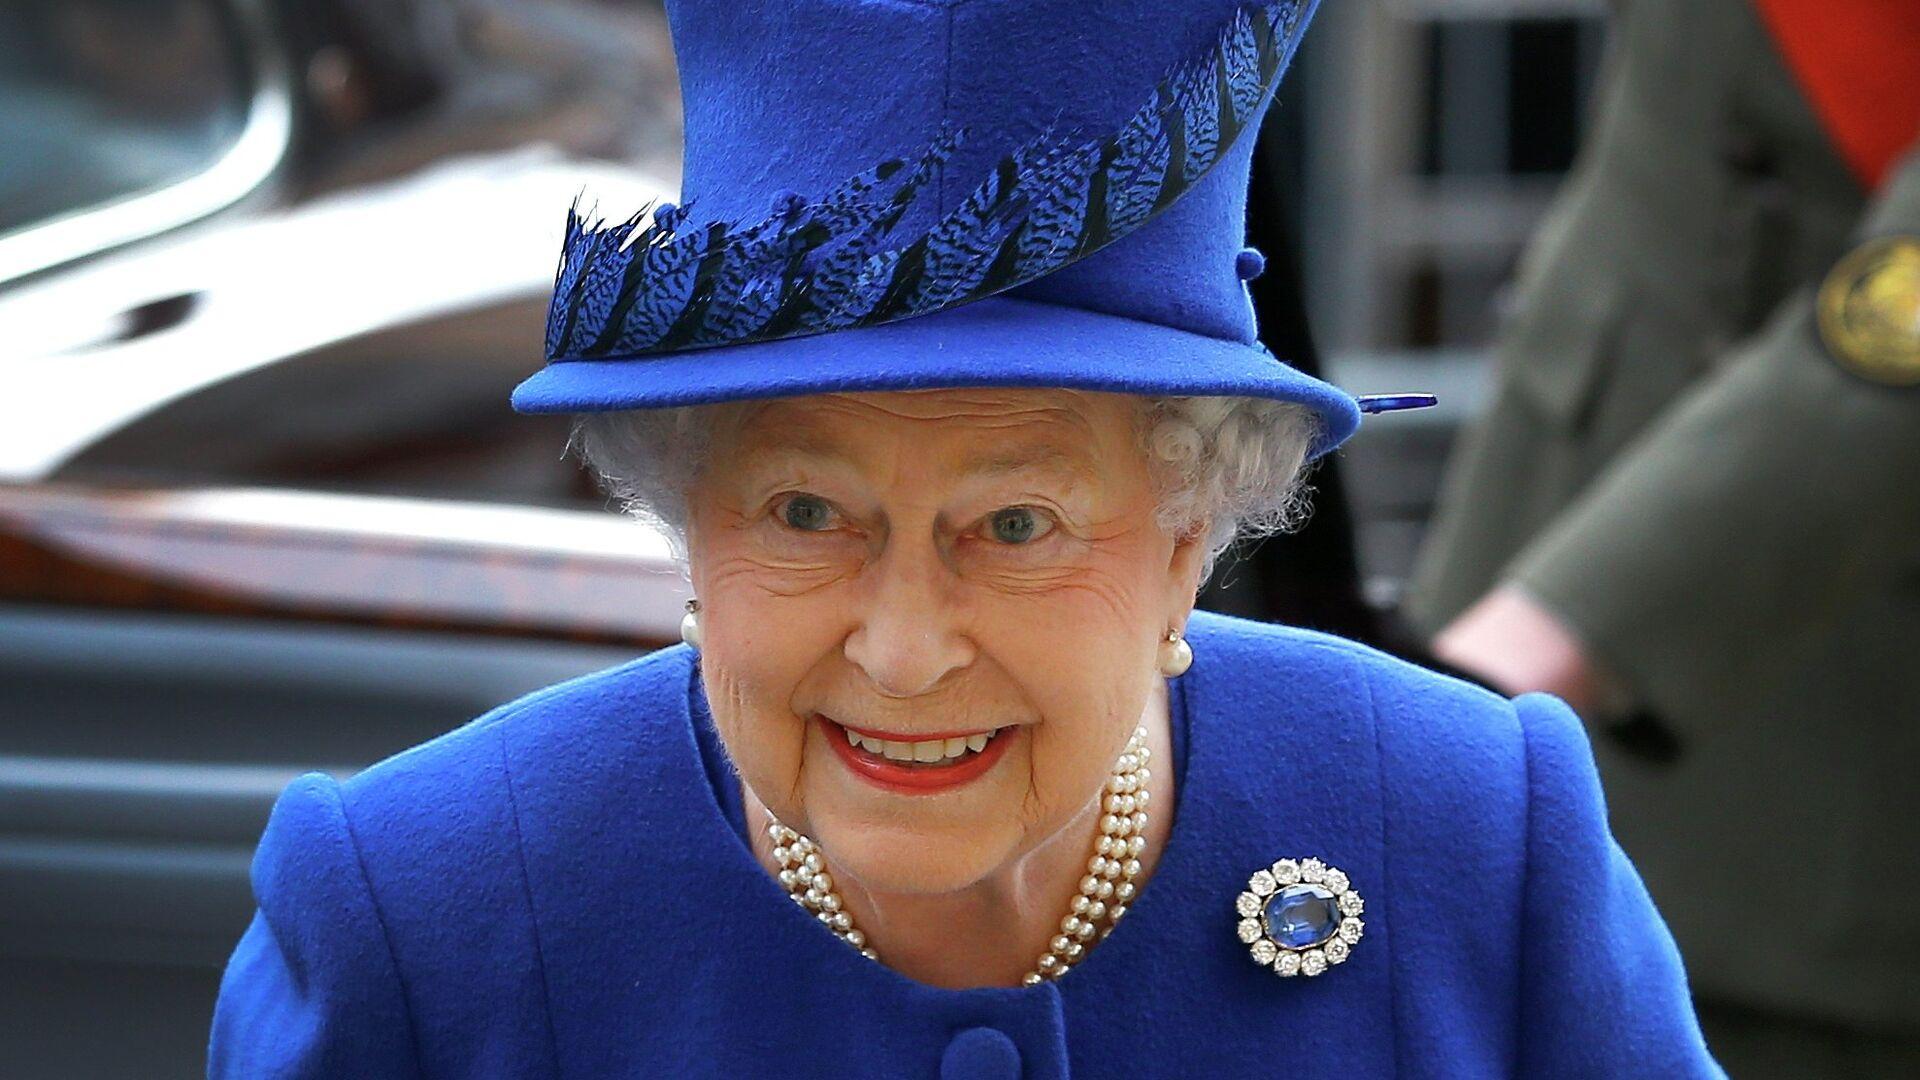 Королева Великобритании Елизавета II. Архивное фото - РИА Новости, 1920, 09.01.2021